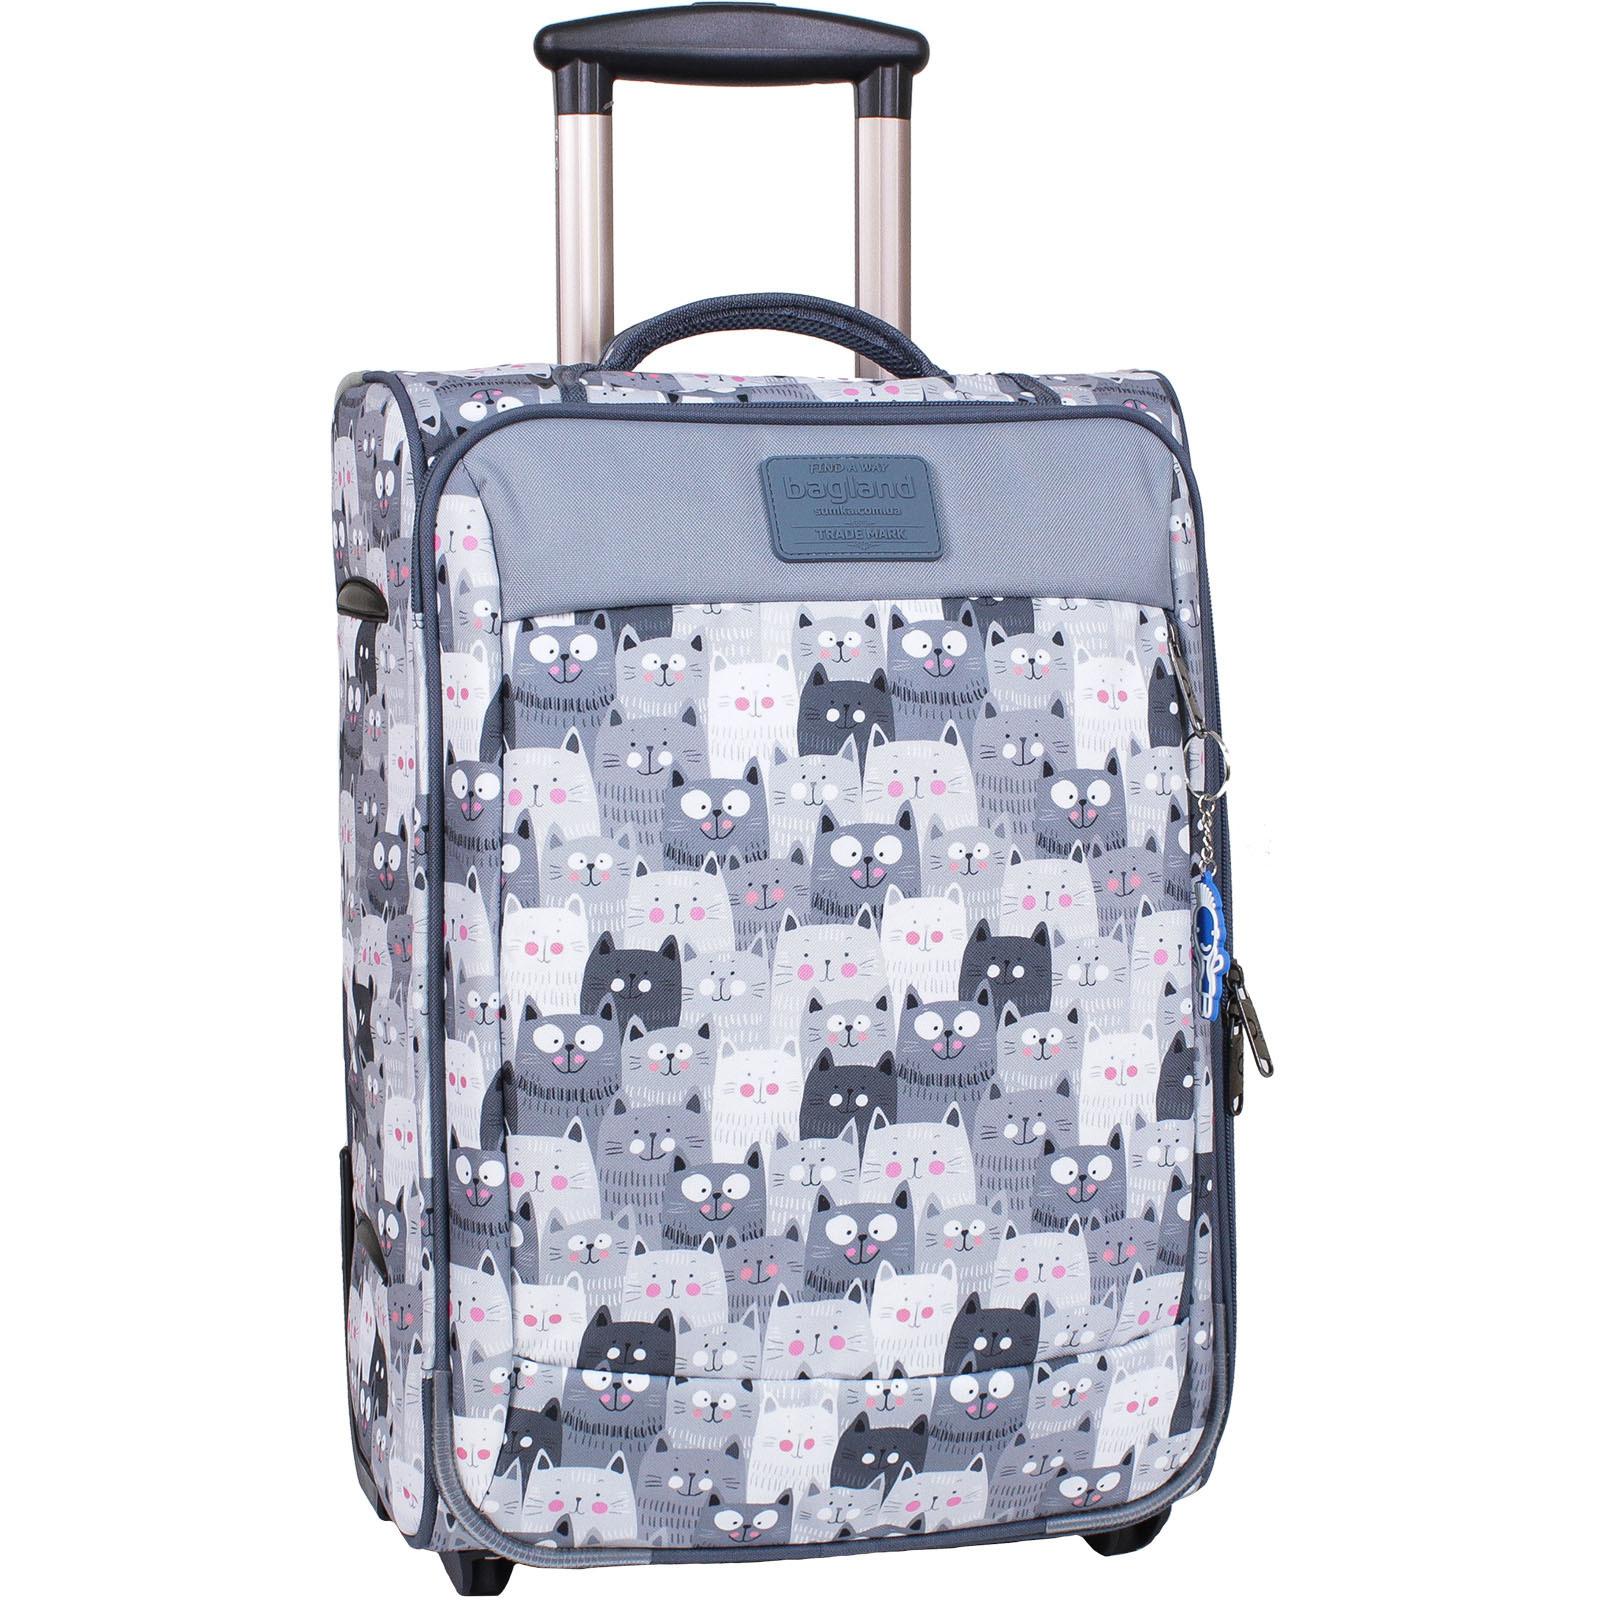 Дорожные чемоданы Чемодан Bagland Vichenzo 32 л. сублімація 342 (0037666194) IMG_7929-1600.jpg